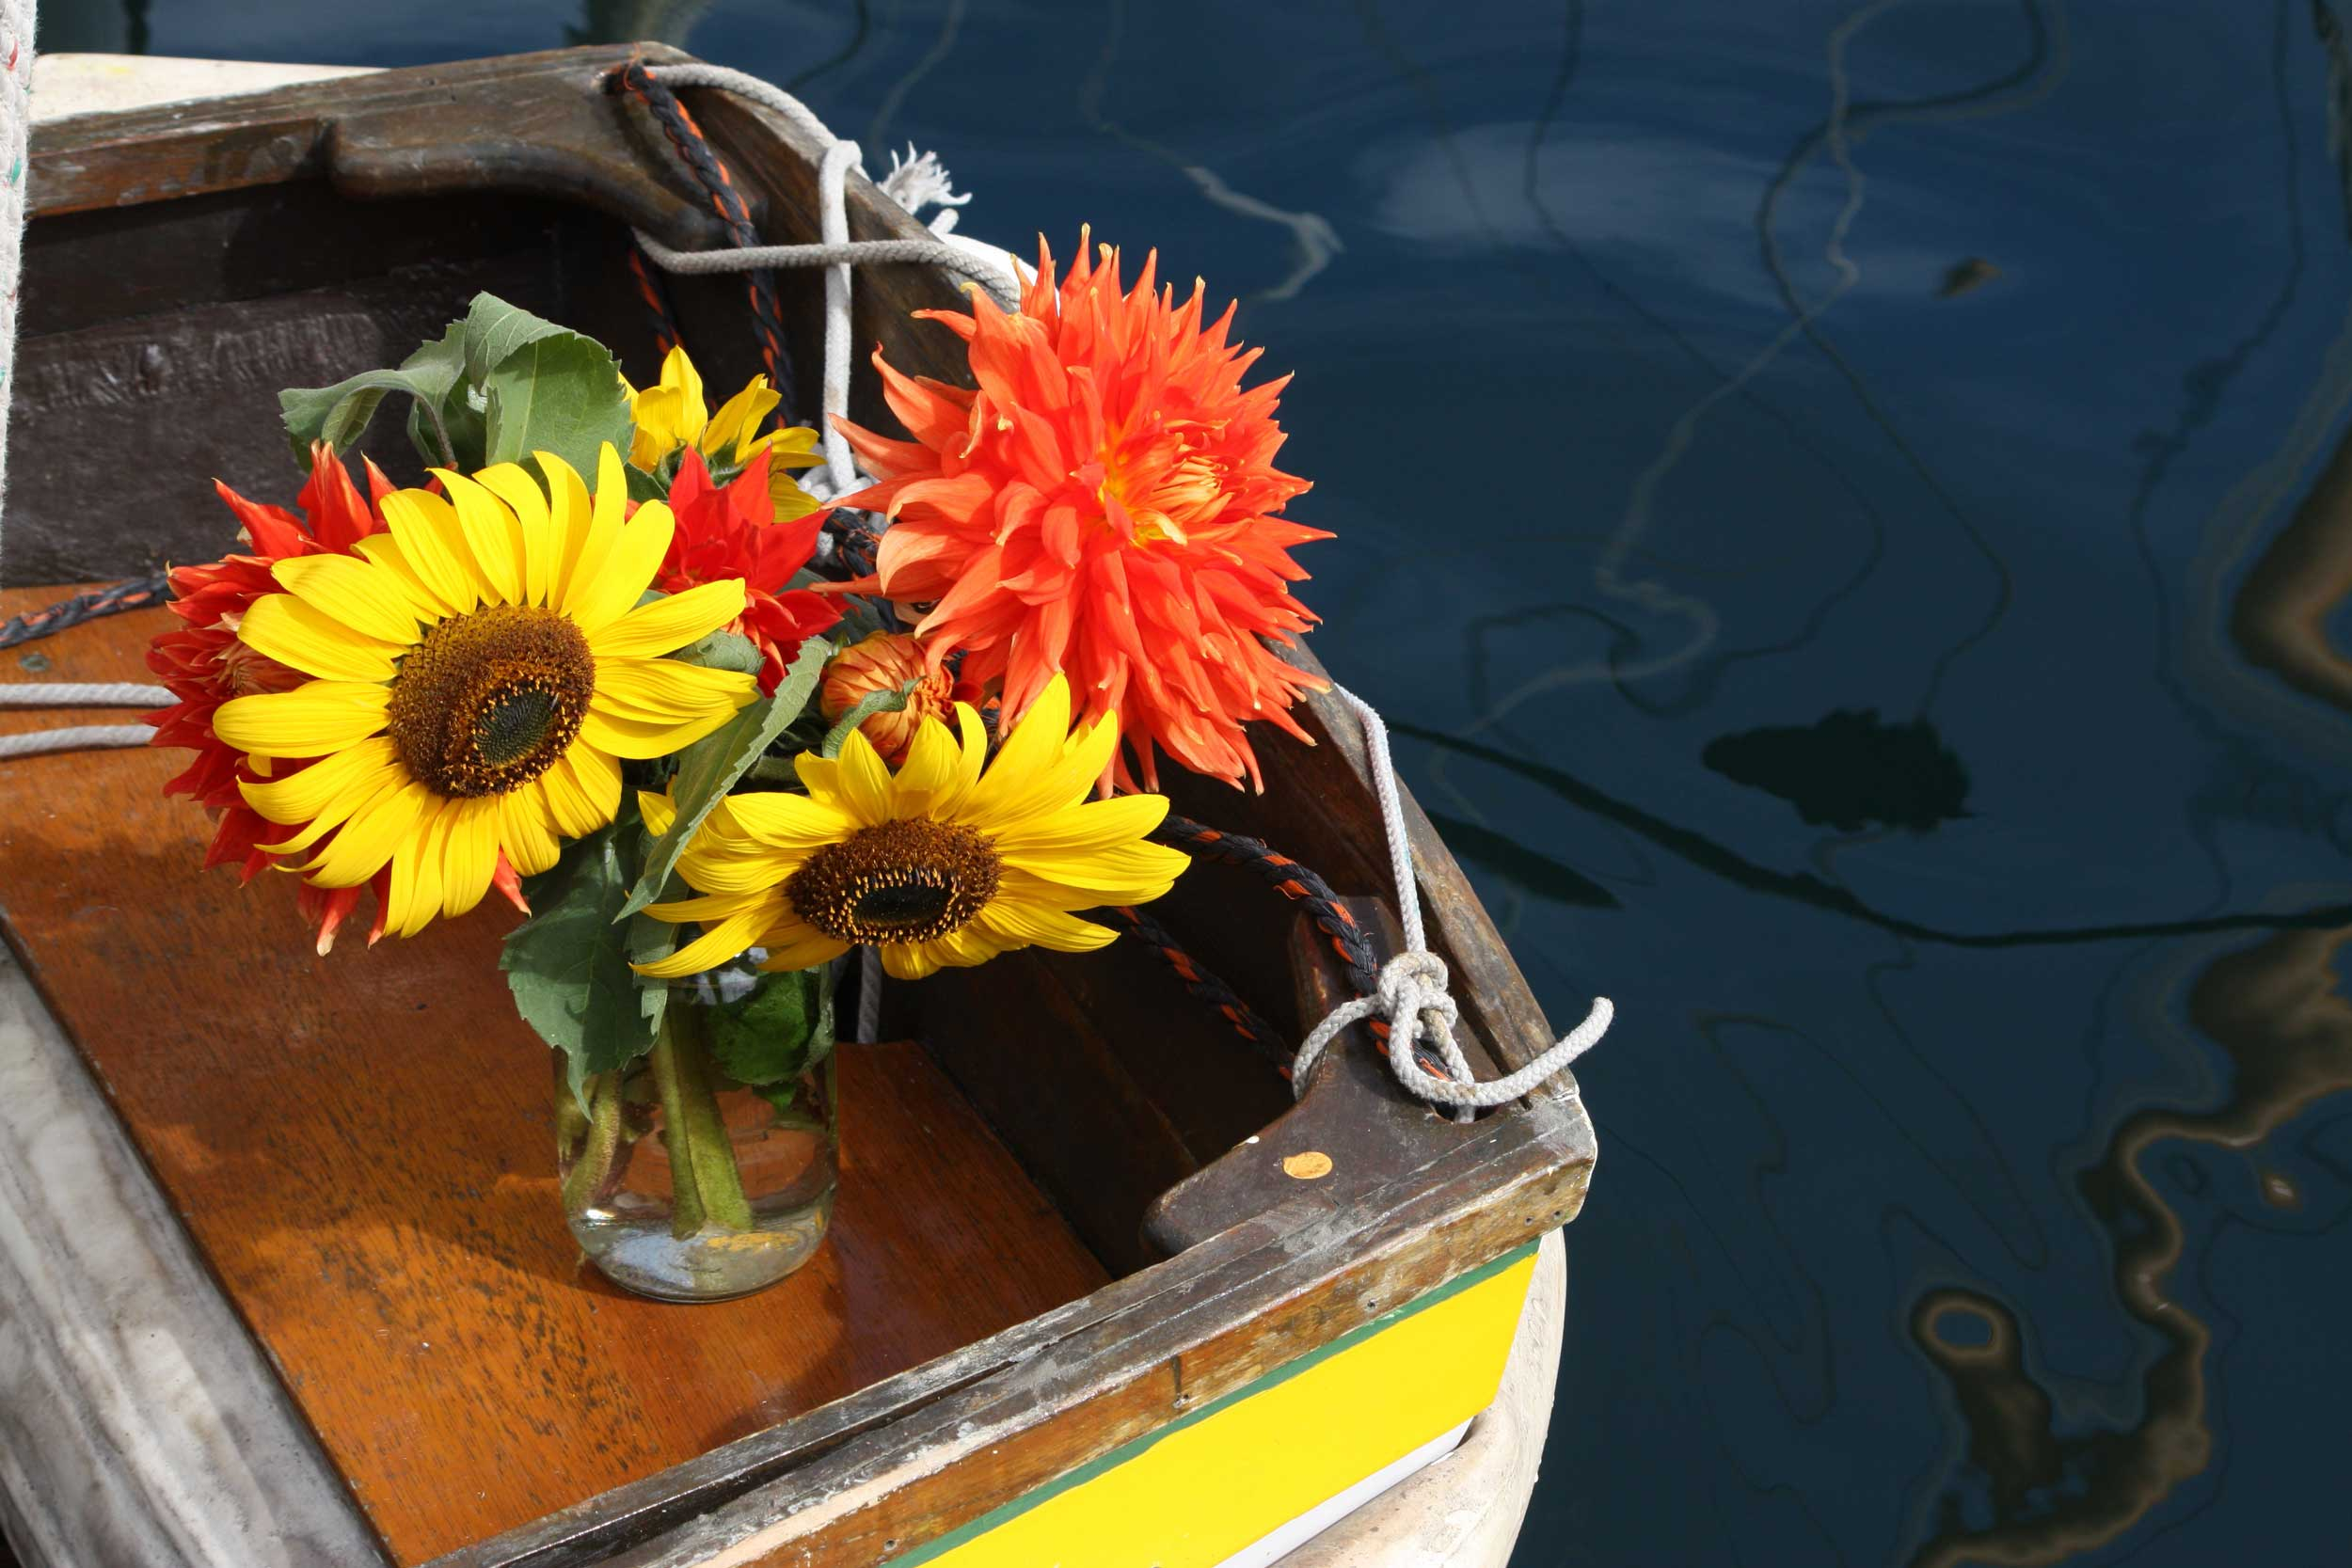 Yellow-Sunflowers-in-Boat_web.jpg